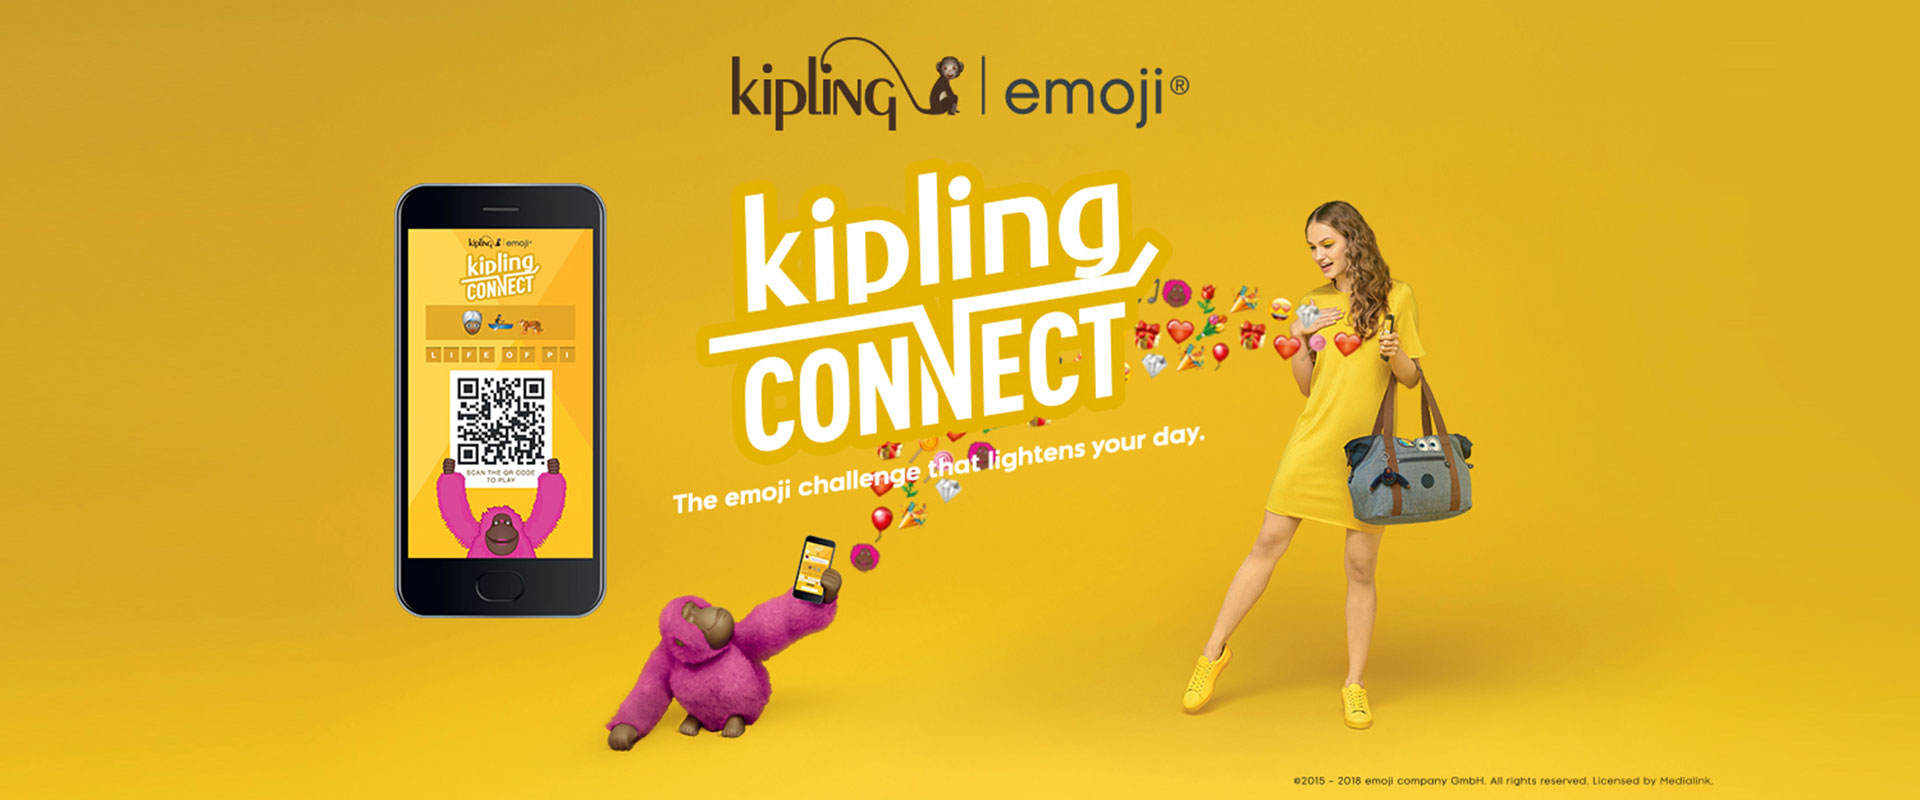 Kipling x emoji®